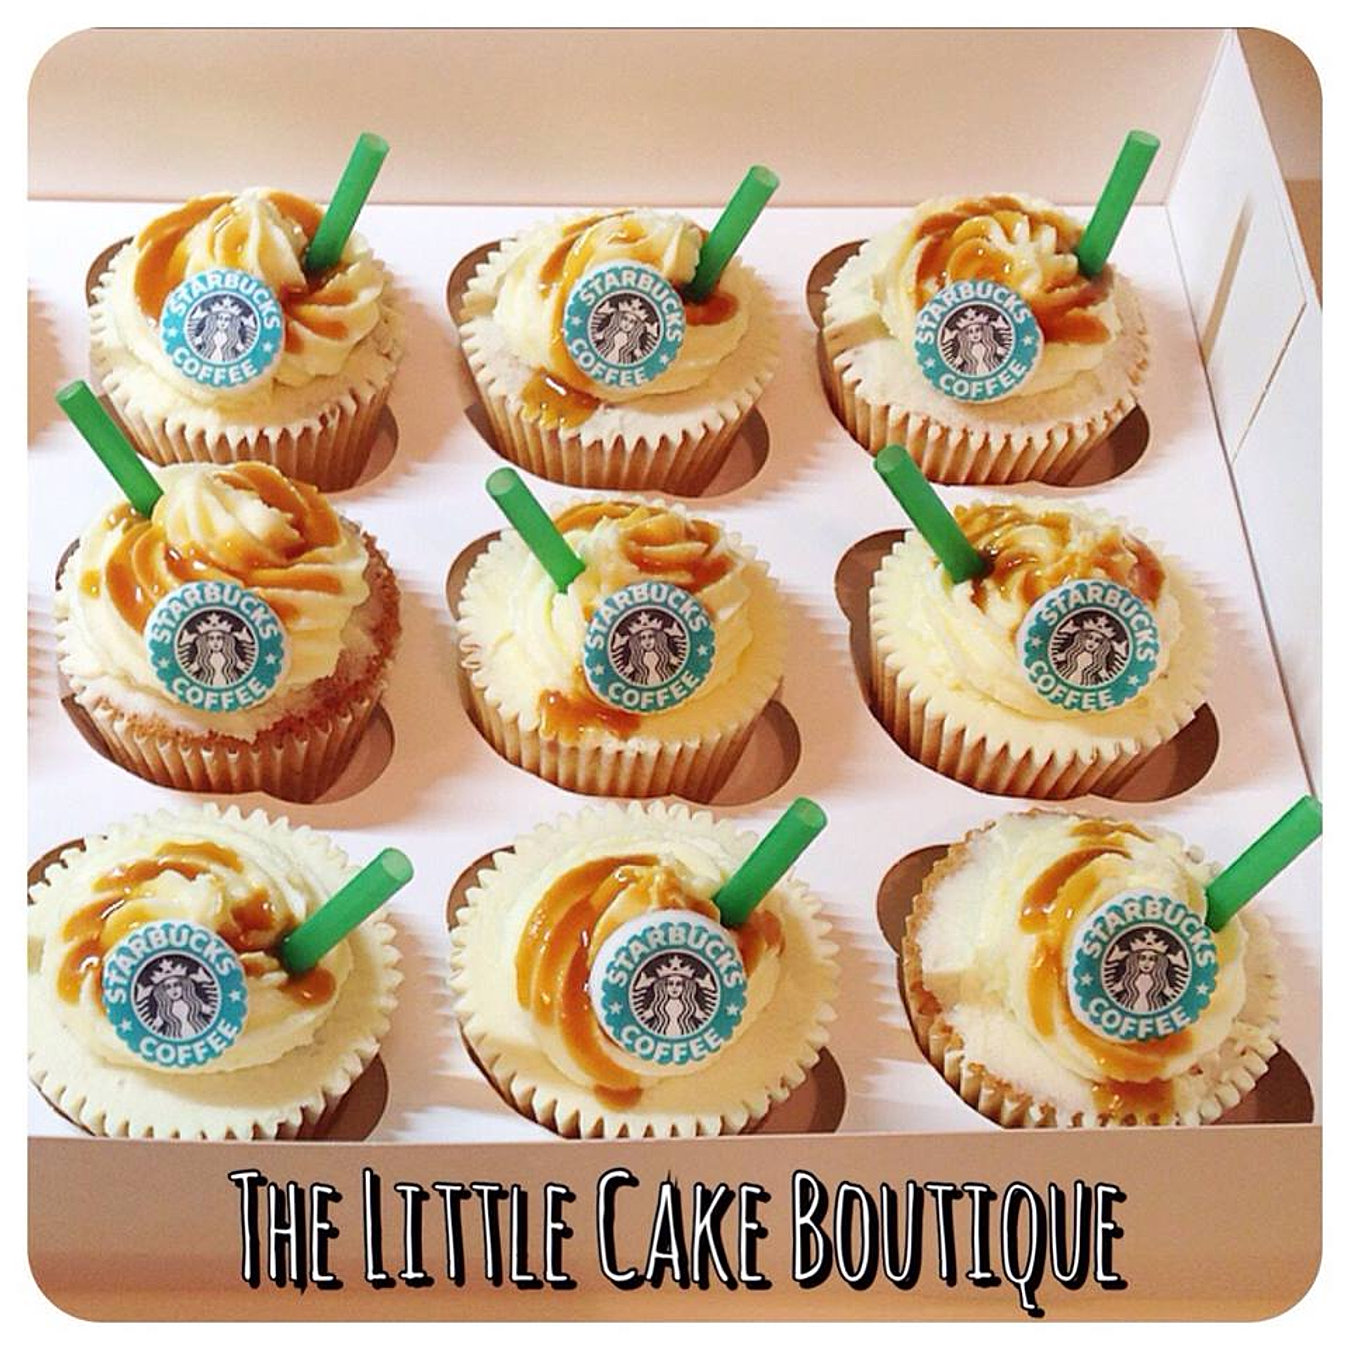 Cupcakes Solihull - Birthday cakes solihull